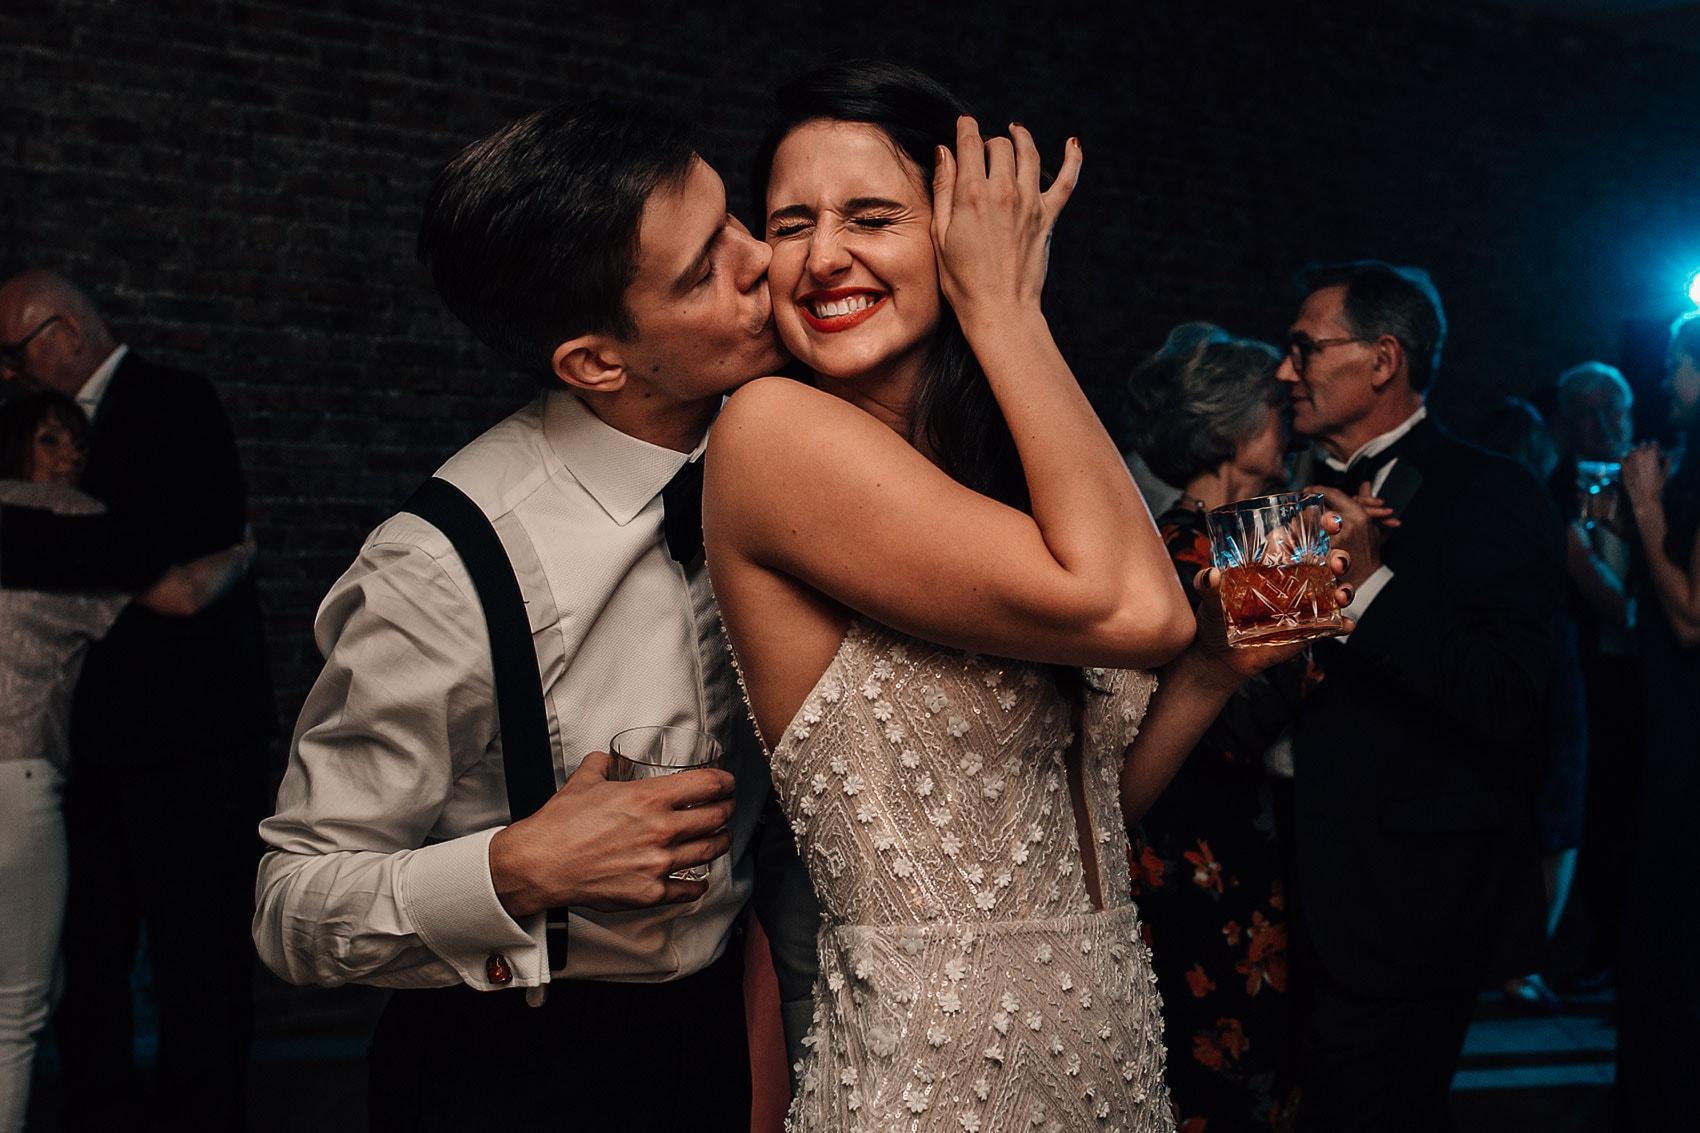 Great Gatsby style wedding photography